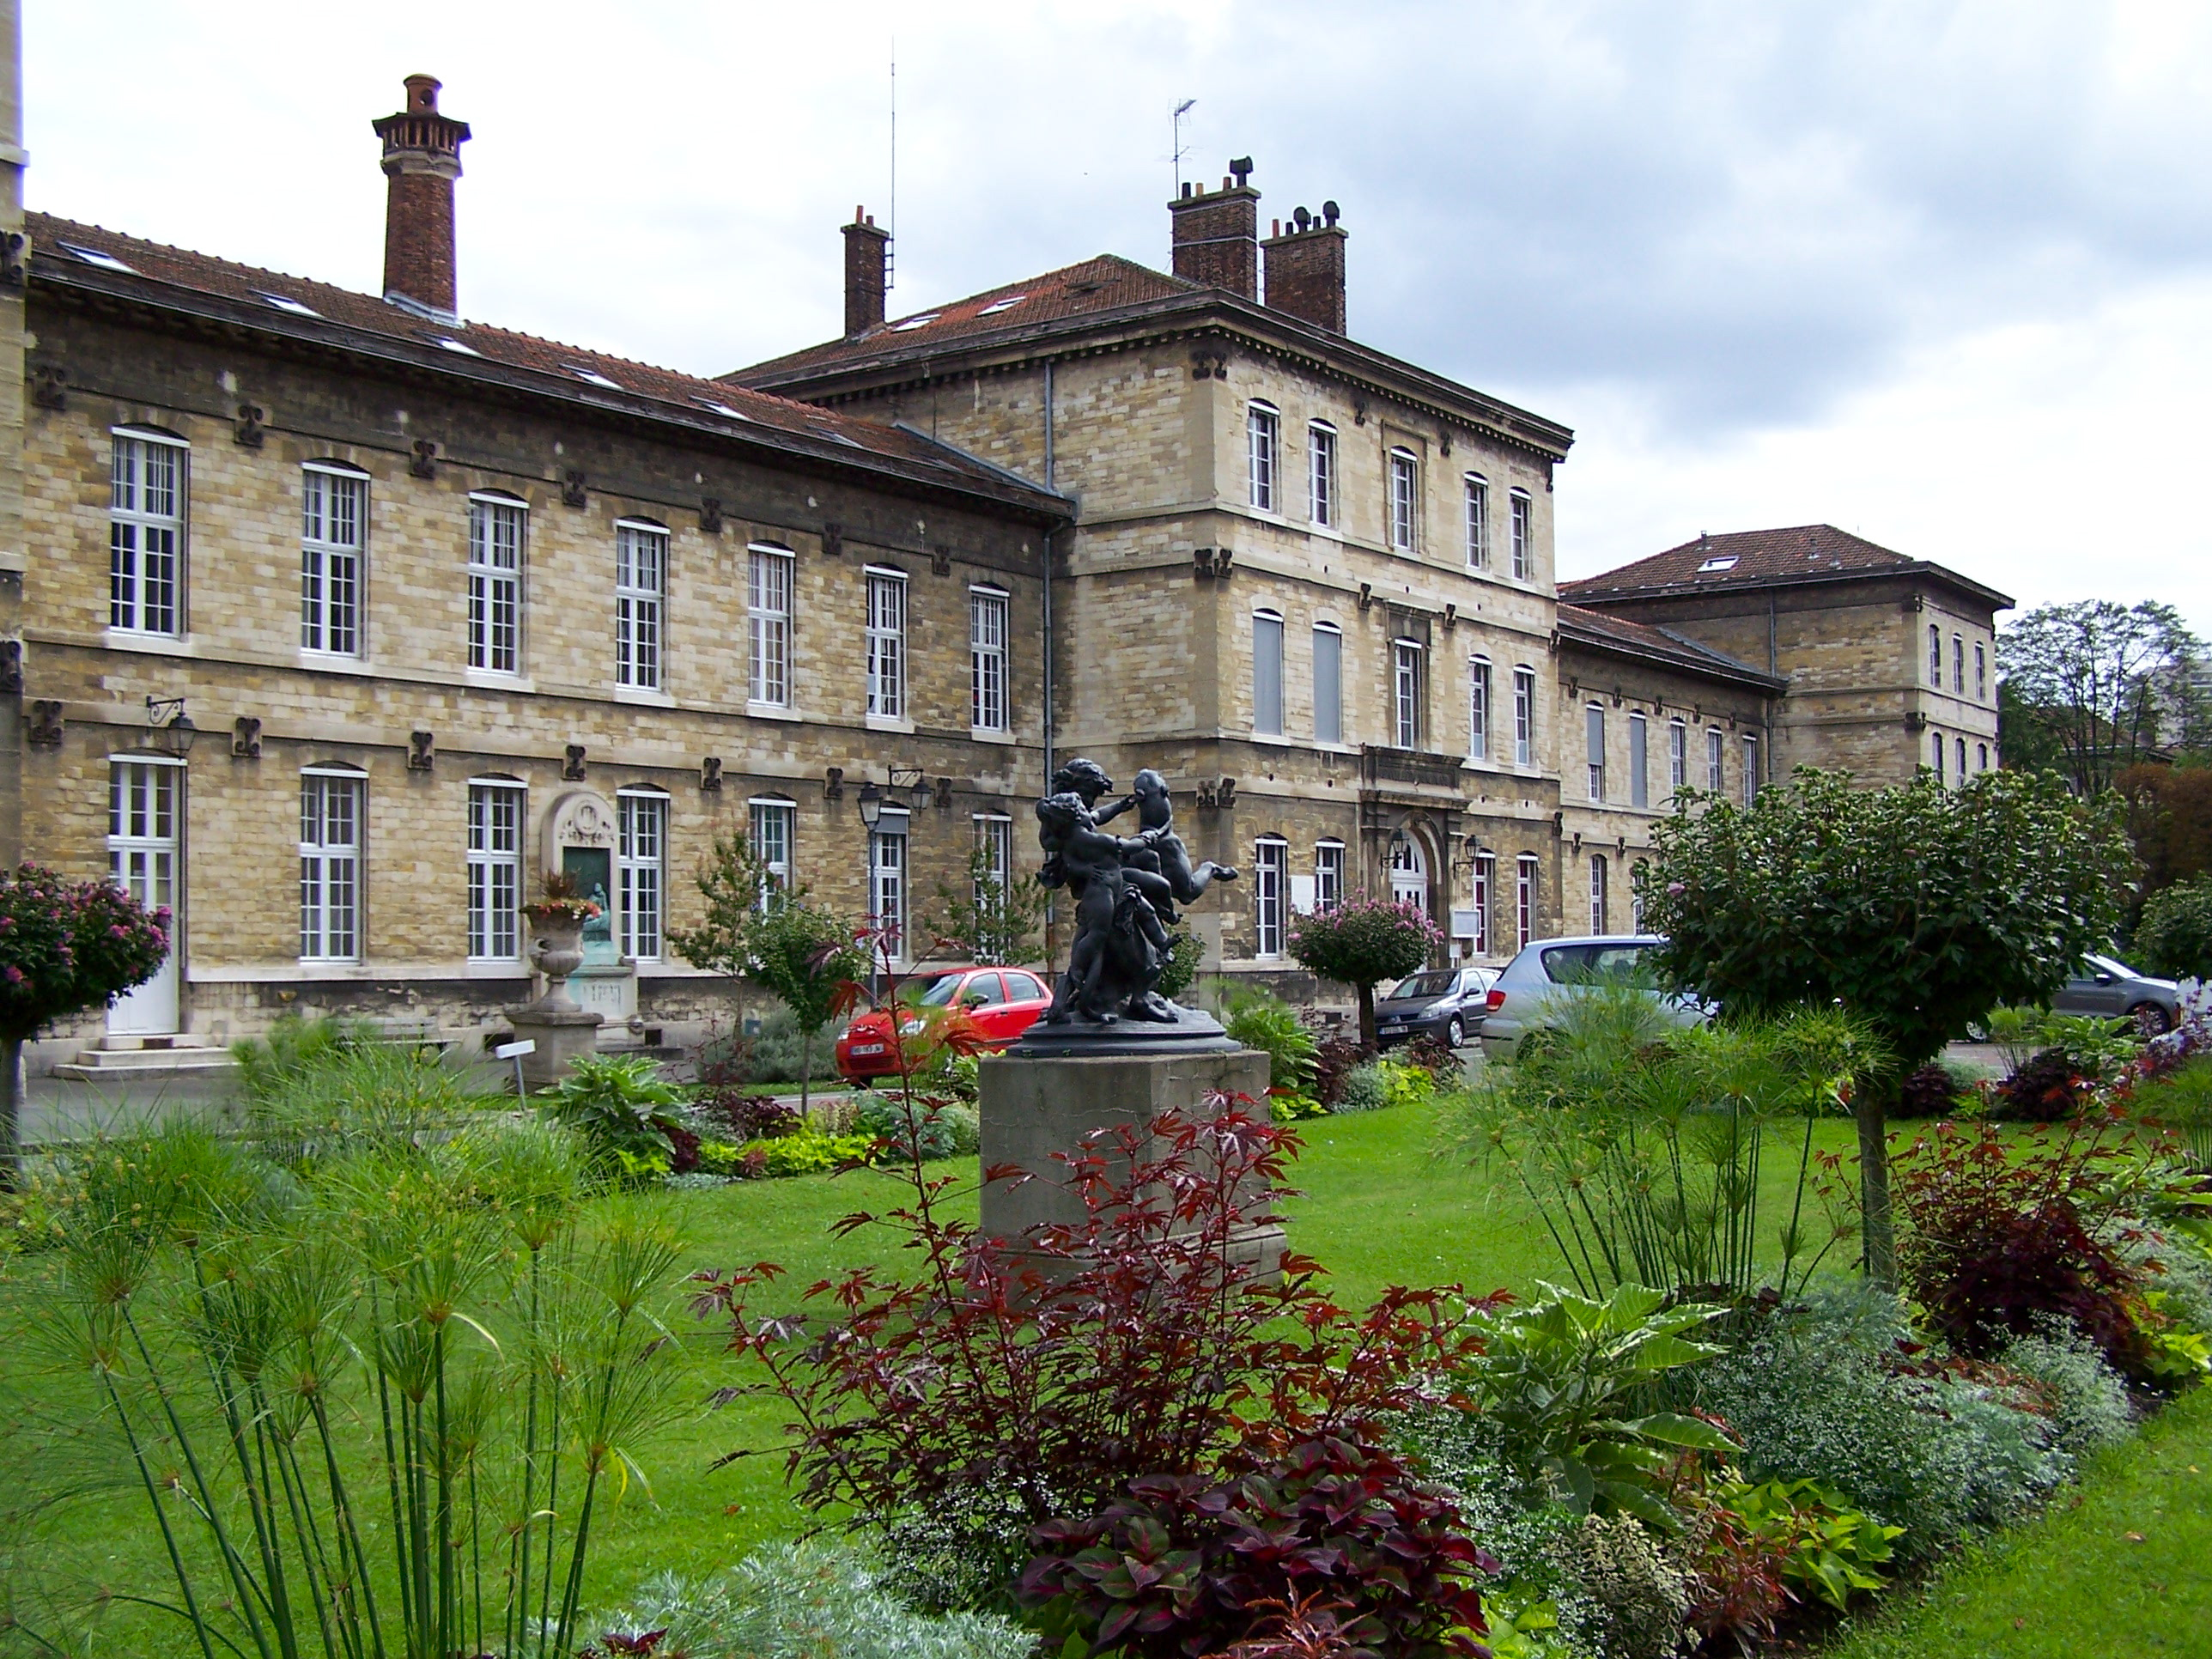 http://upload.wikimedia.org/wikipedia/commons/9/93/Pavillon_Magnan_de_l%27h%C3%B4pital_Sainte-Anne.JPG